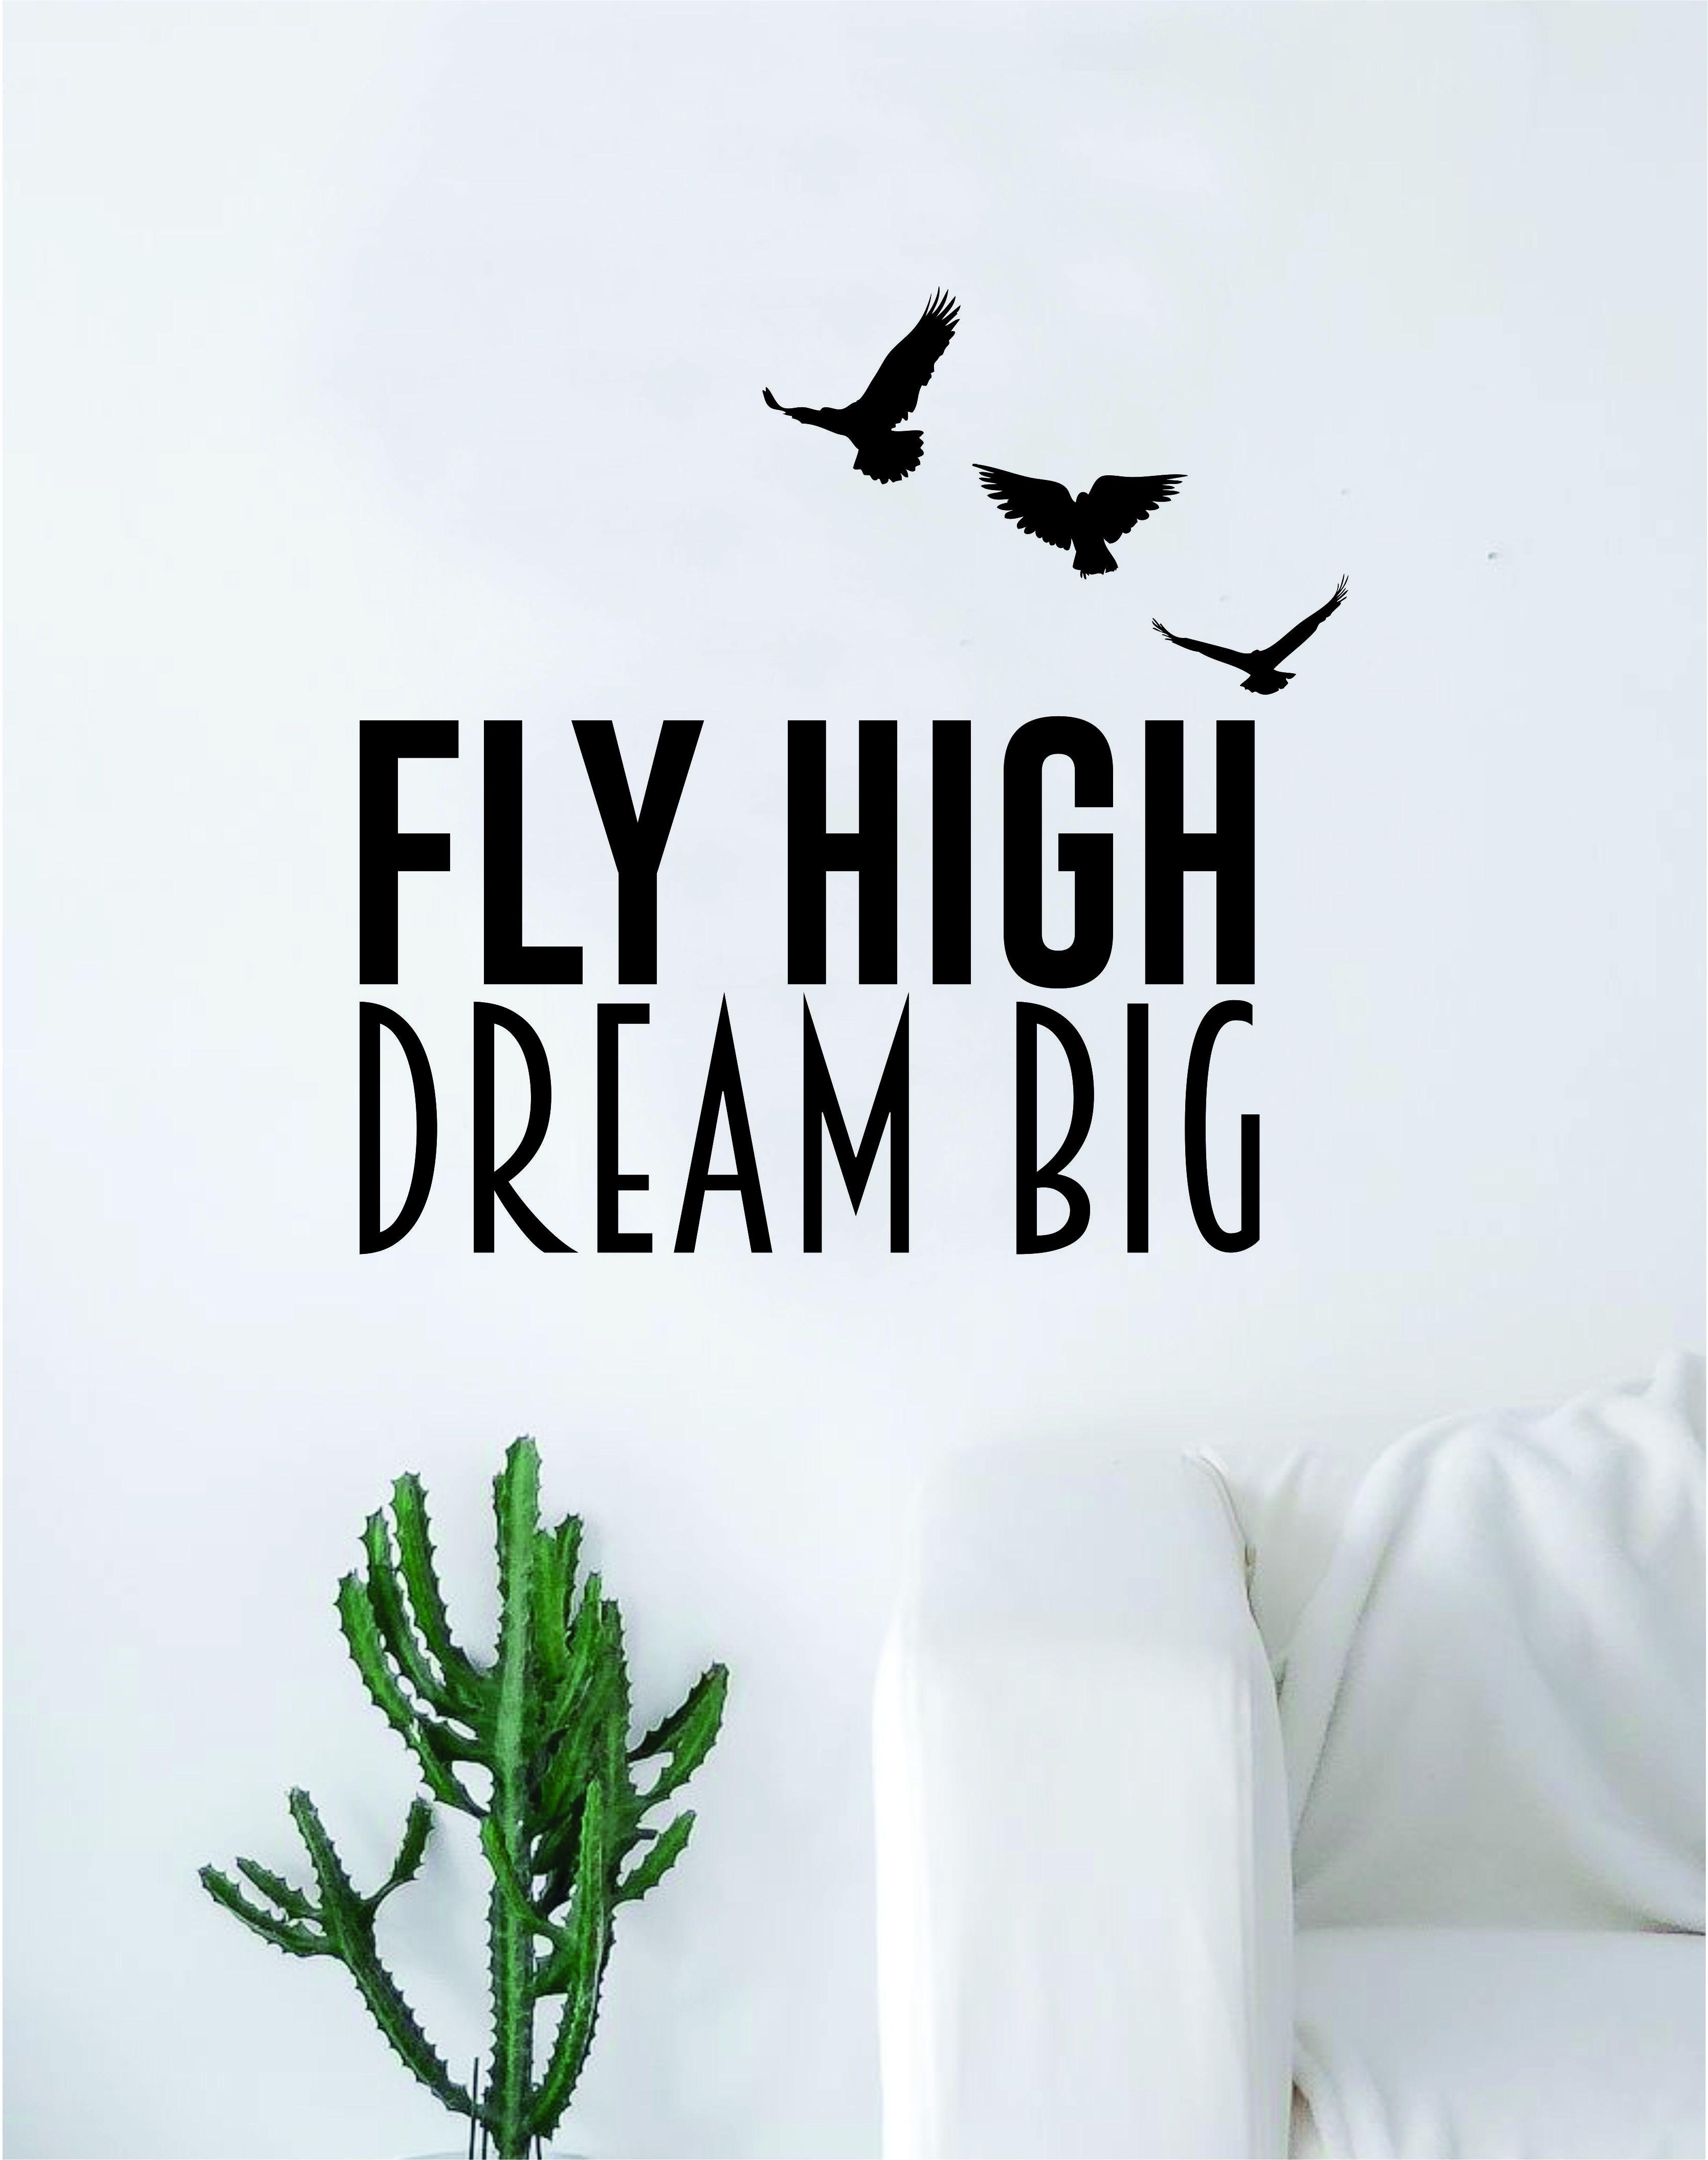 Fly High Dream Big Quote Decal Sticker Wall Vinyl Art Home Decor Inspirational Birds - black